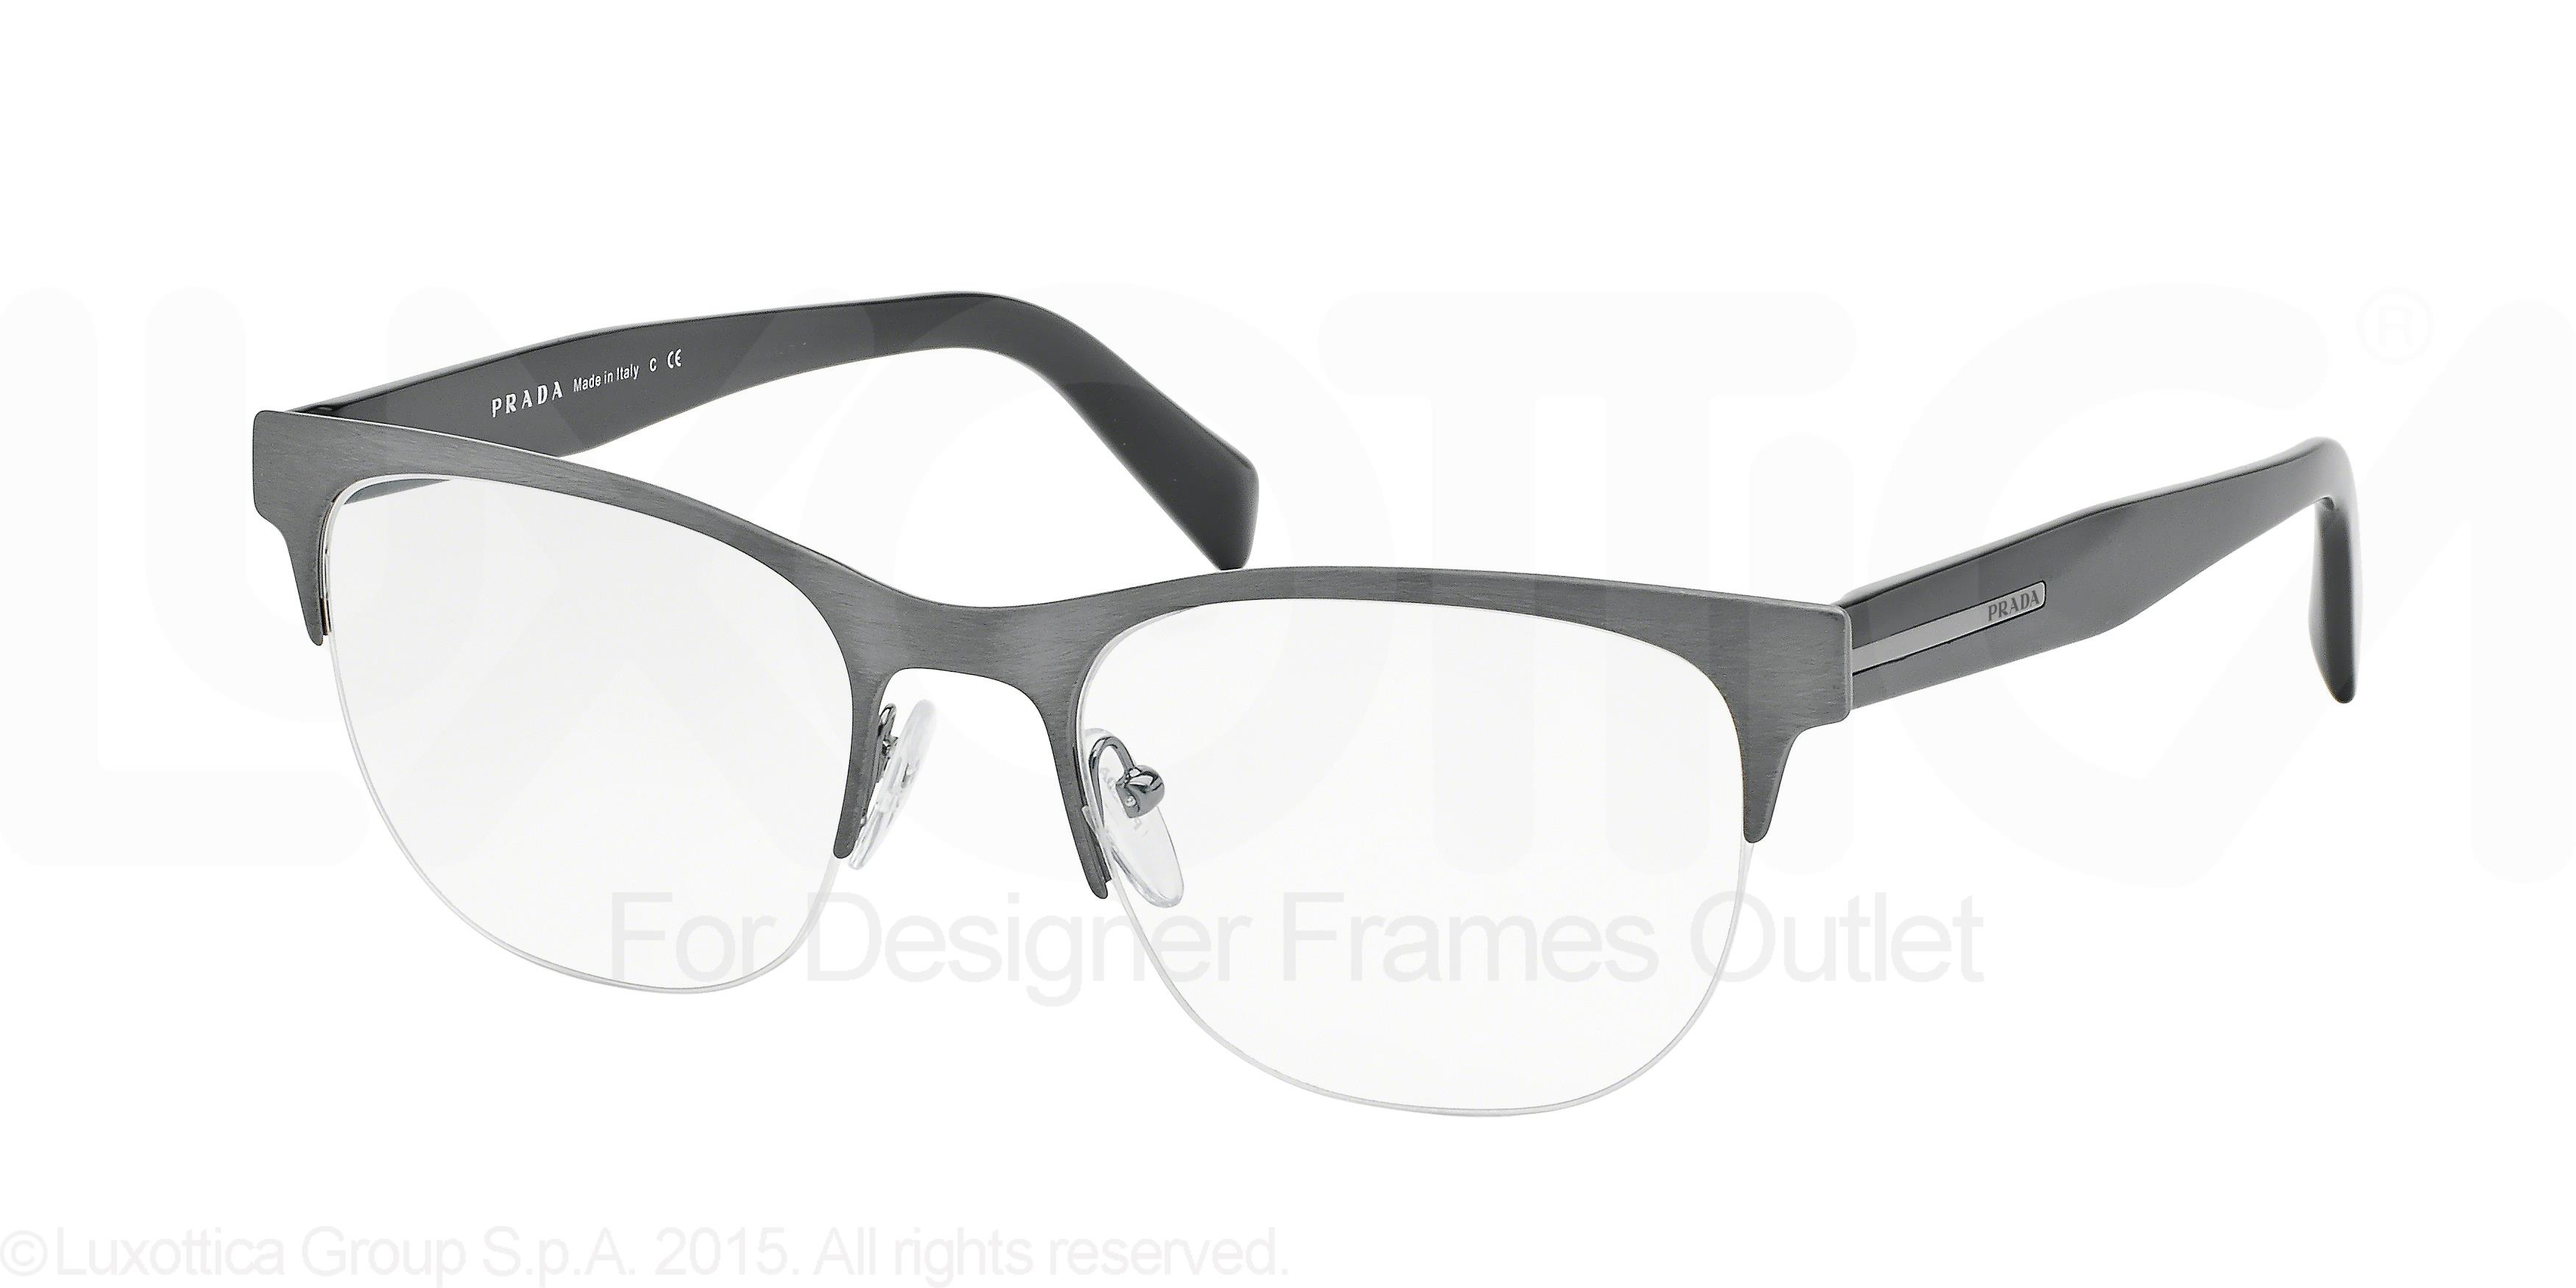 9f3776659f27 Designer Frames Outlet. Prada PR54RV